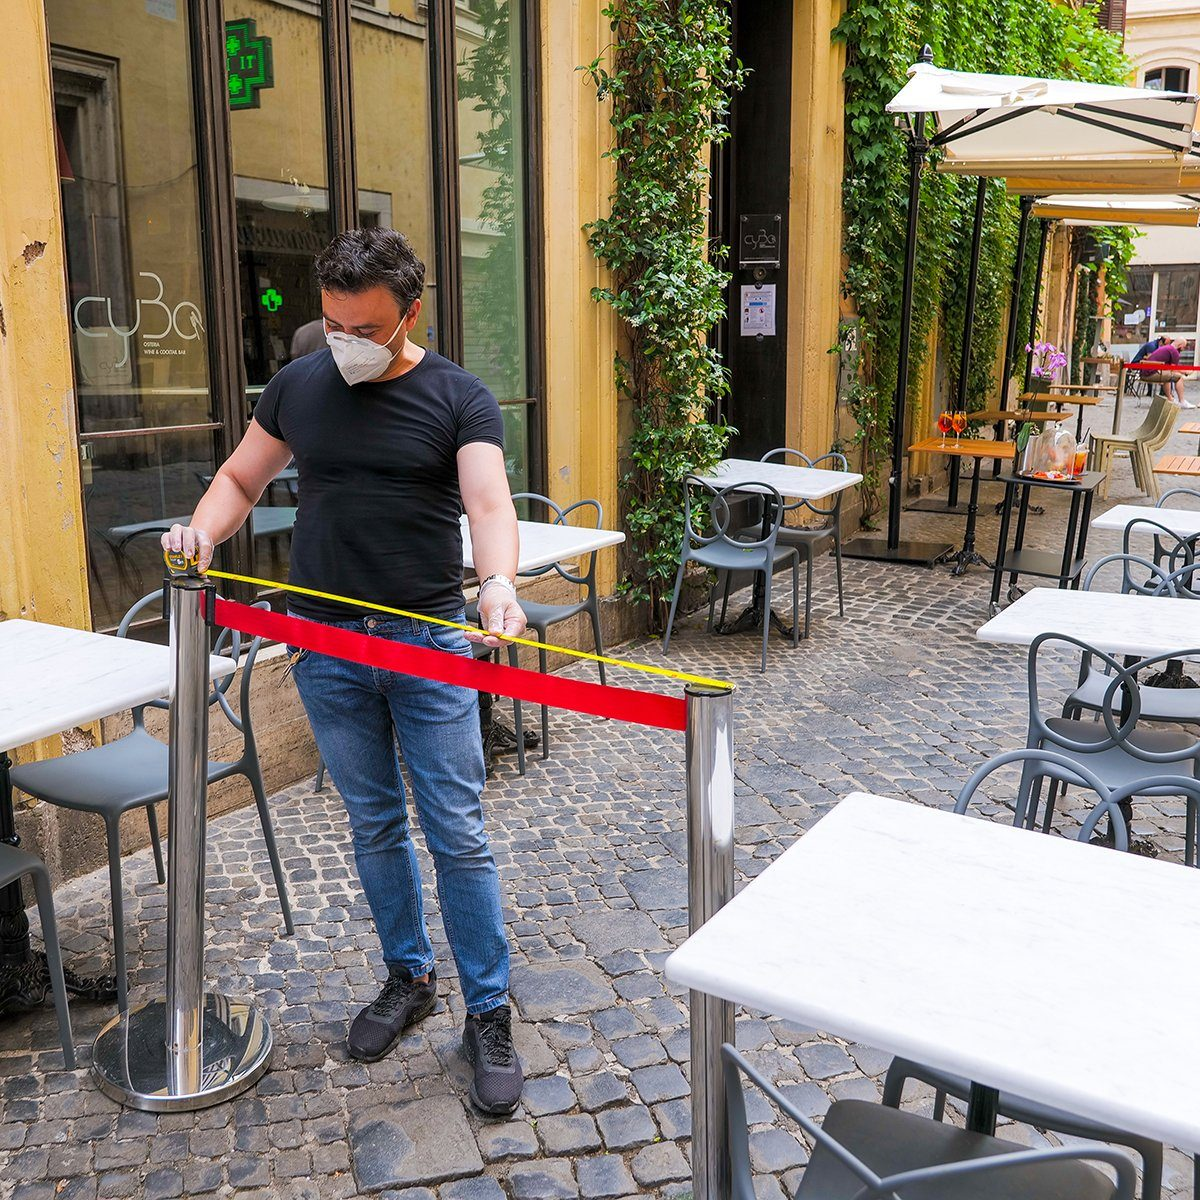 restaurant worker measuring